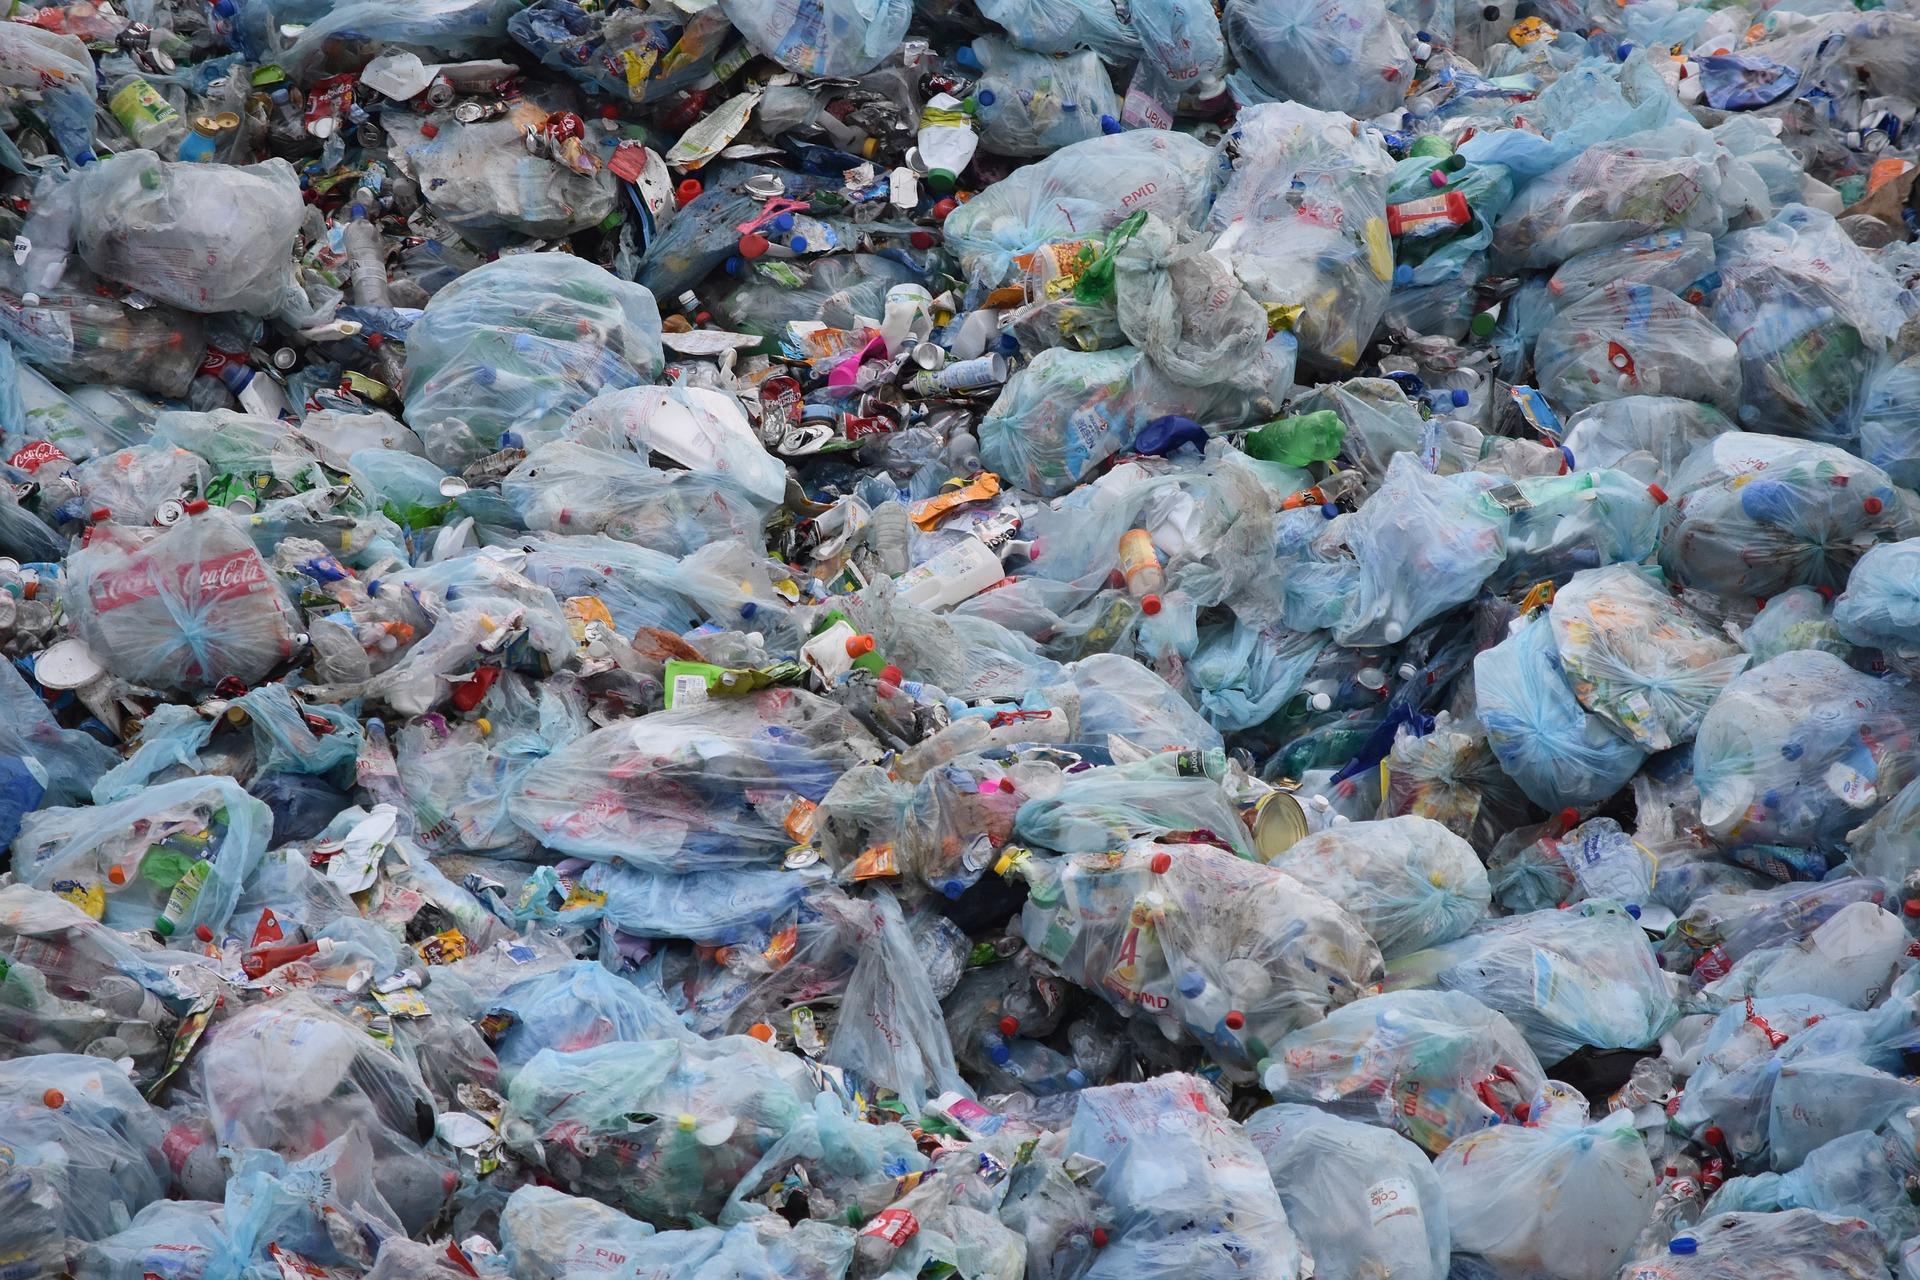 waste-1741127_1920.jpg